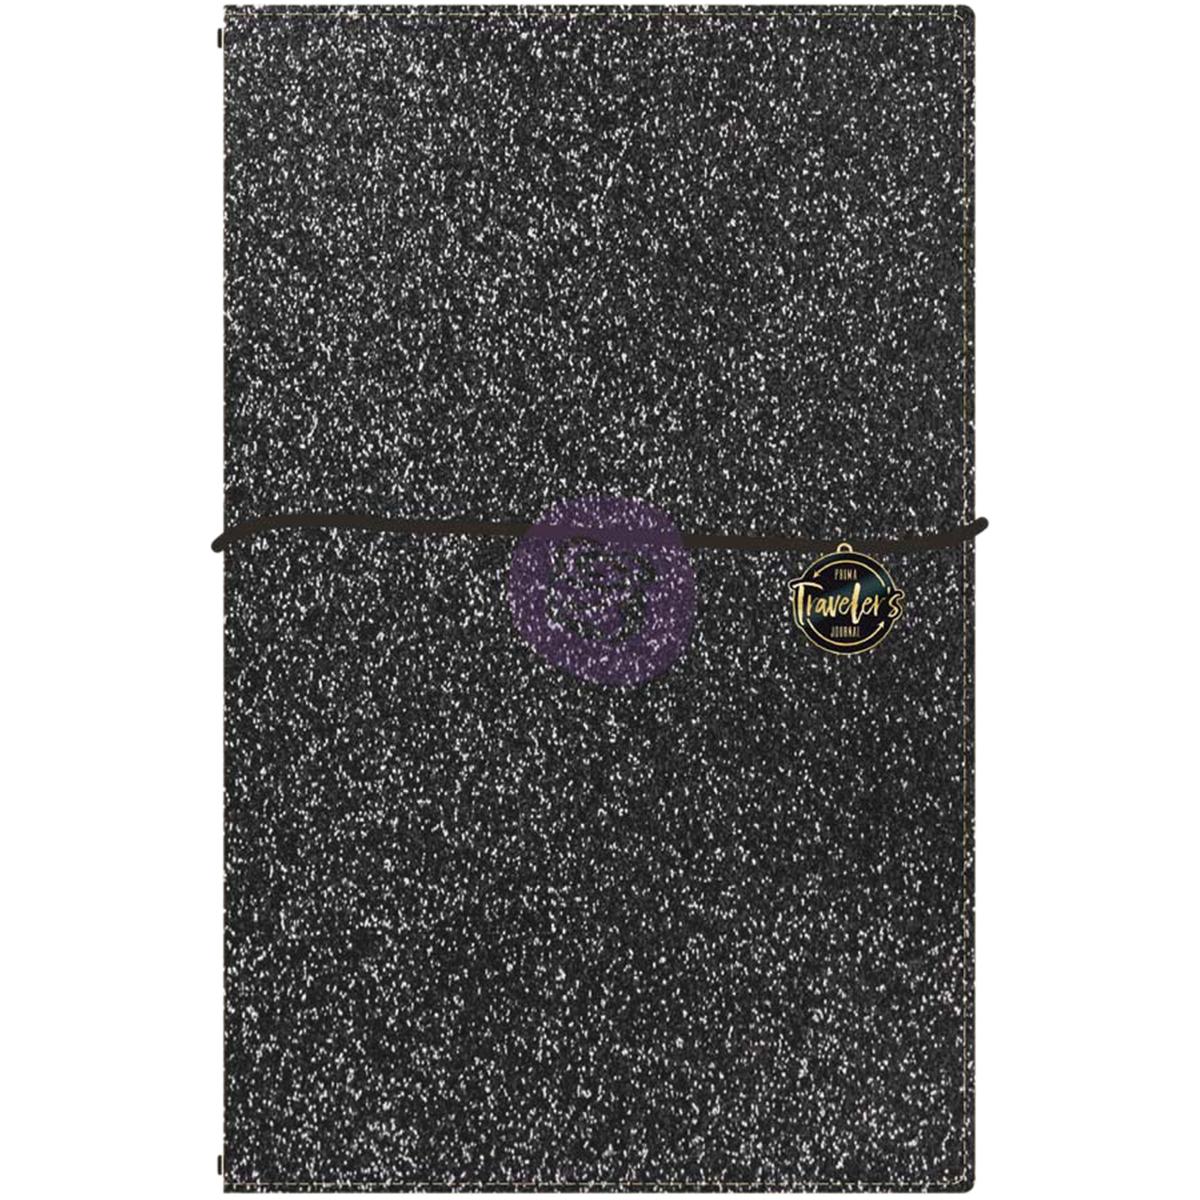 Prima Marketing 592554 Lady Like - Travelers Starter Journal Set